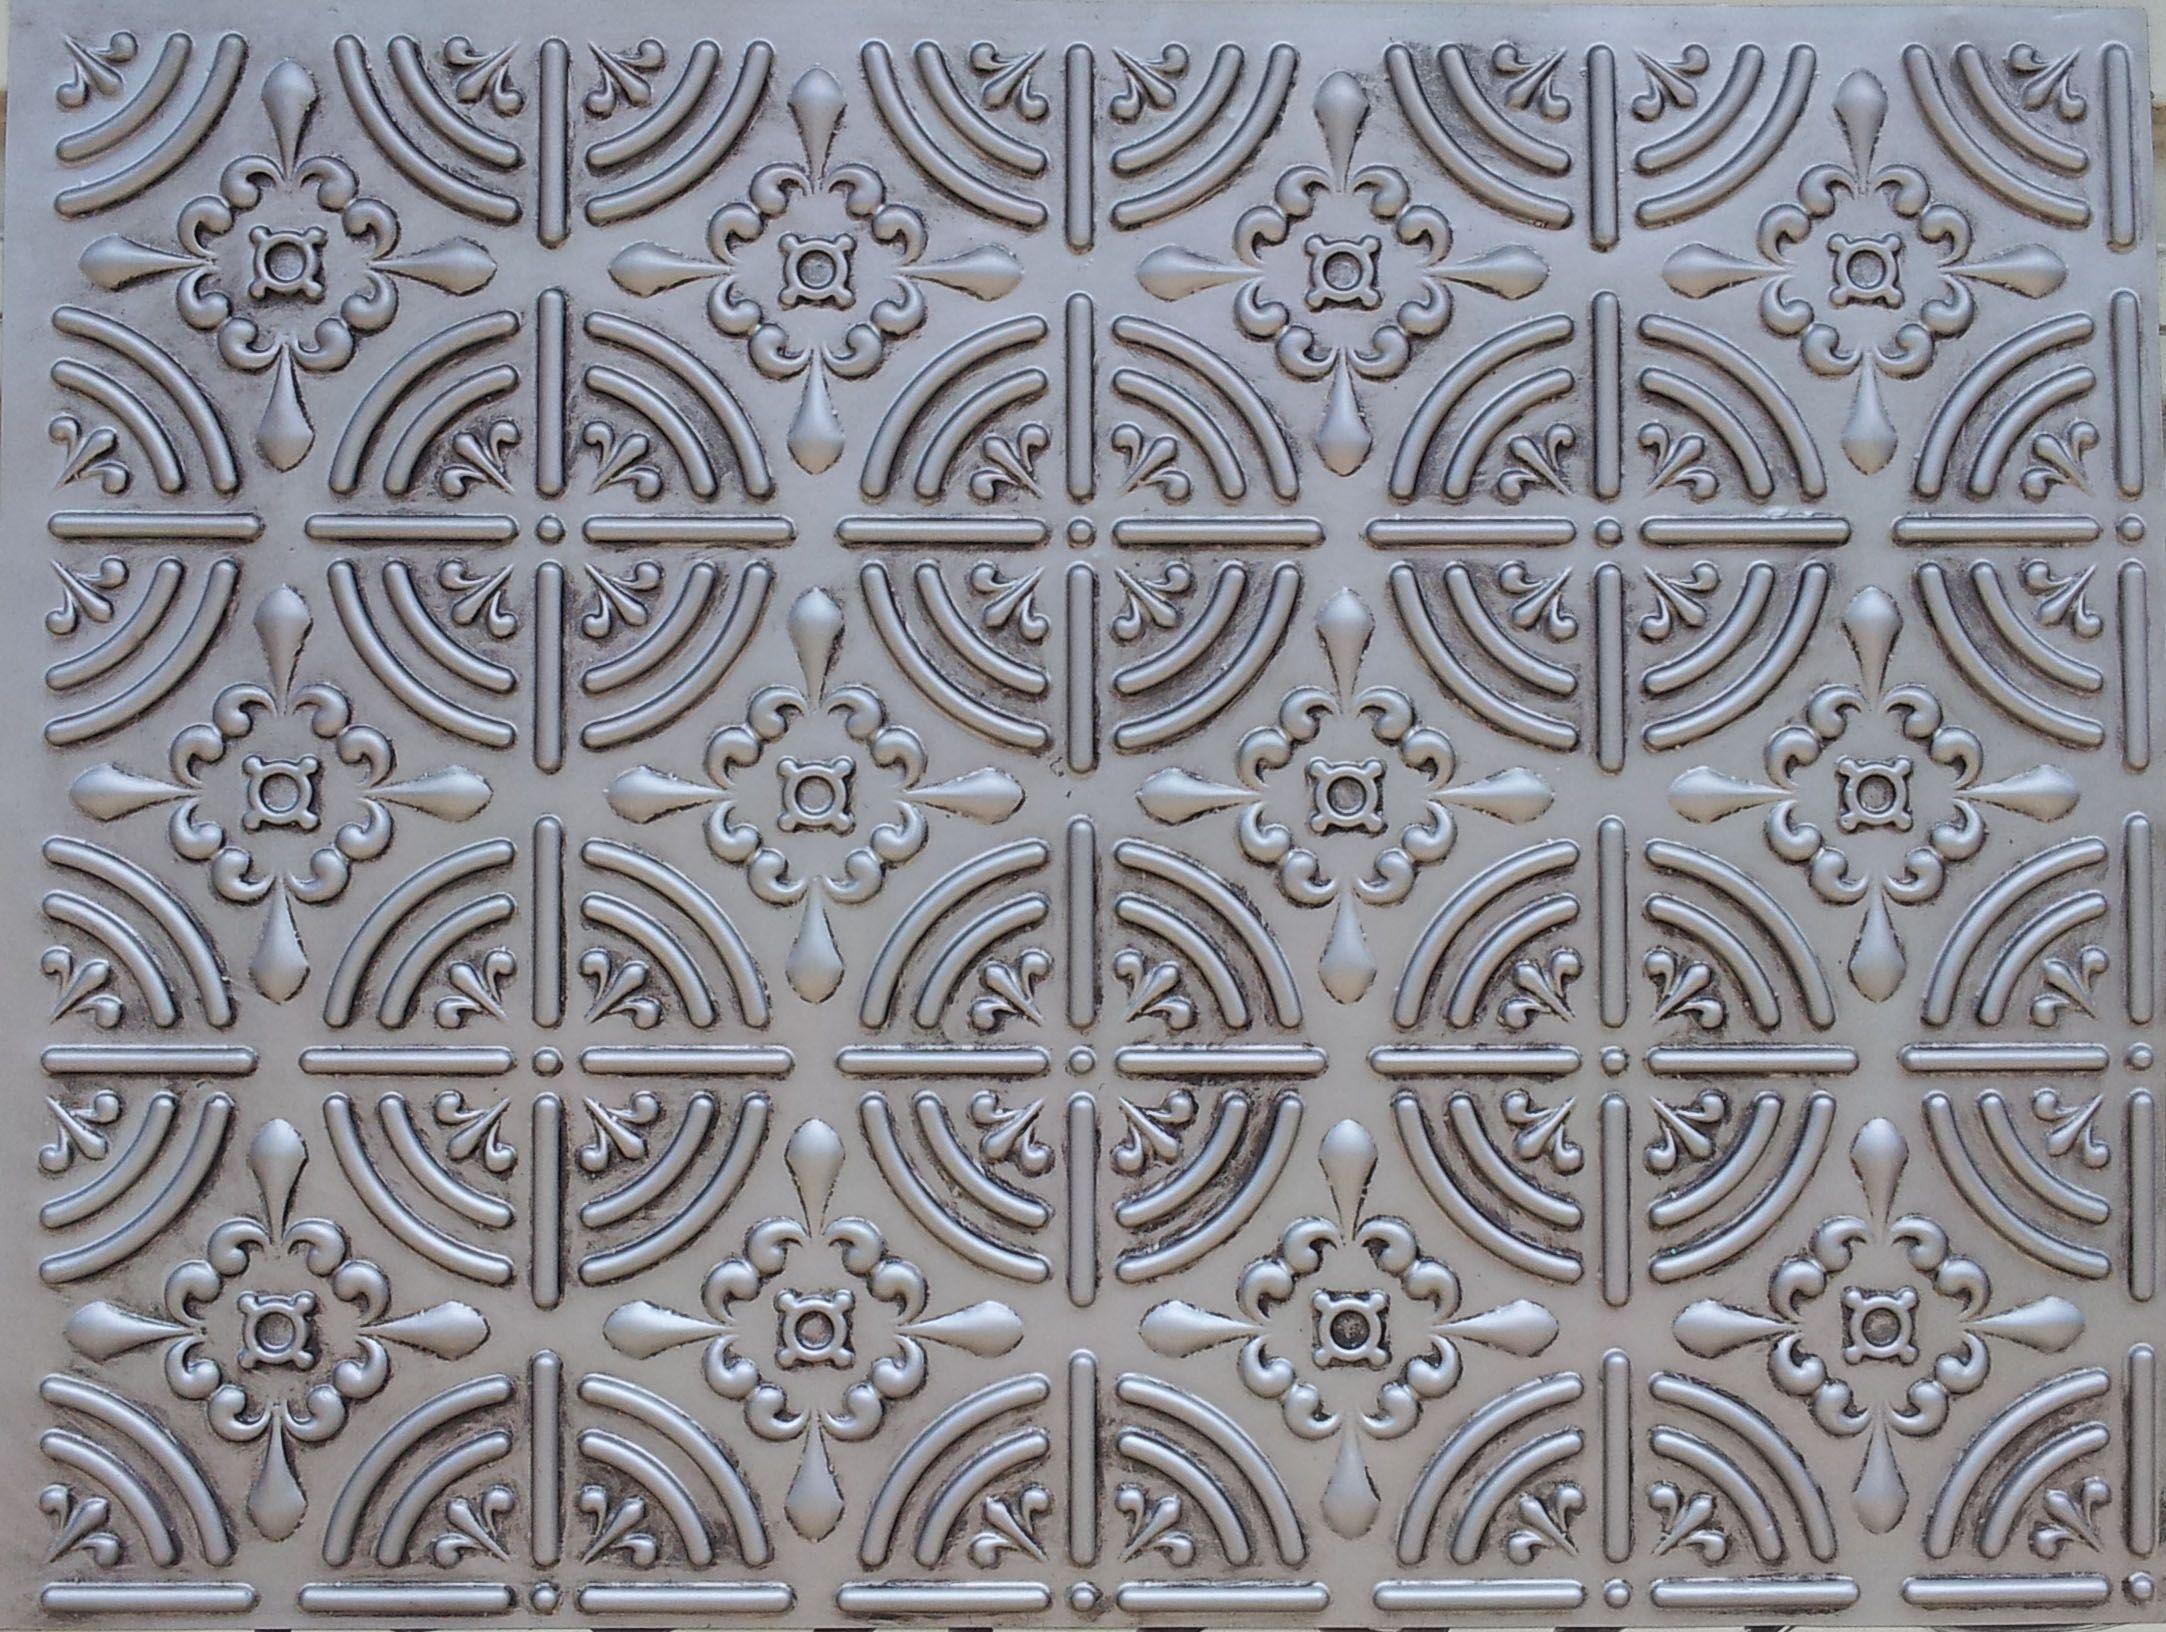 photos faux tin library net decorativeceilingtiles tiles ideas ceiling color by tile schoolhouse silver idea glueup